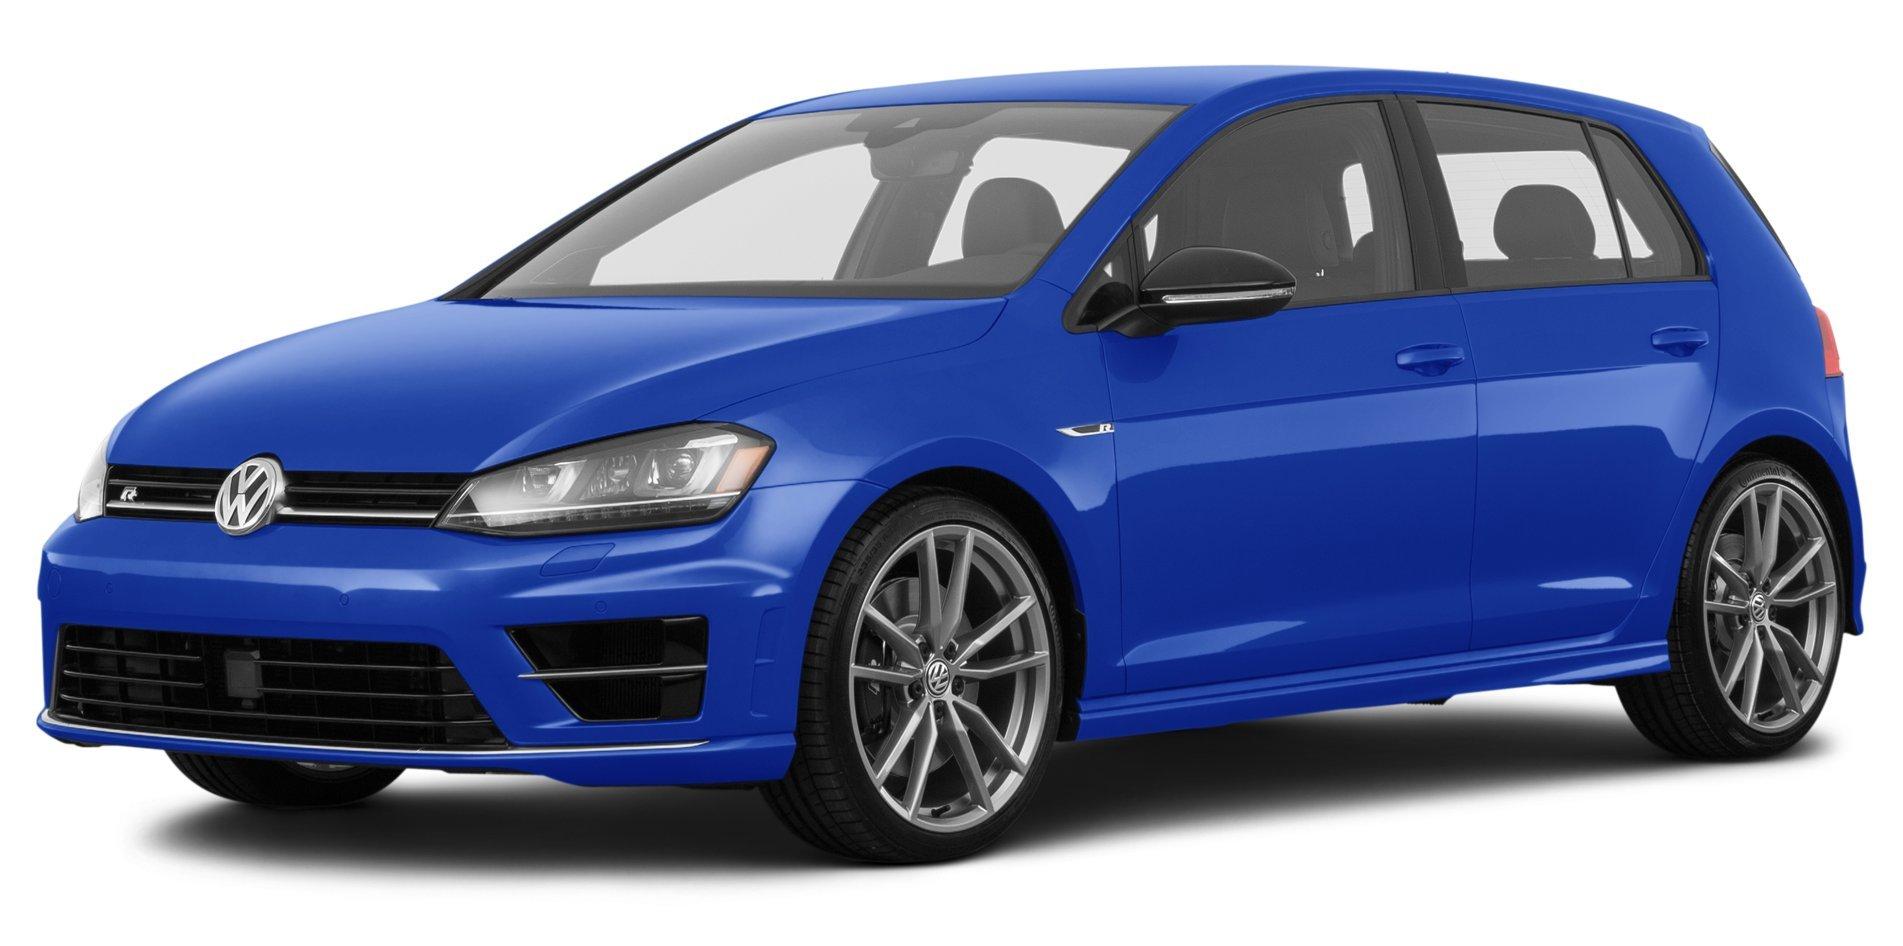 2017 Subaru Wrx Sti Reviews Images And Specs Vehicles Taurus Electric Fan Conversion Vettemodcom Volkswagen Golf R 4 Door Manual Transmission